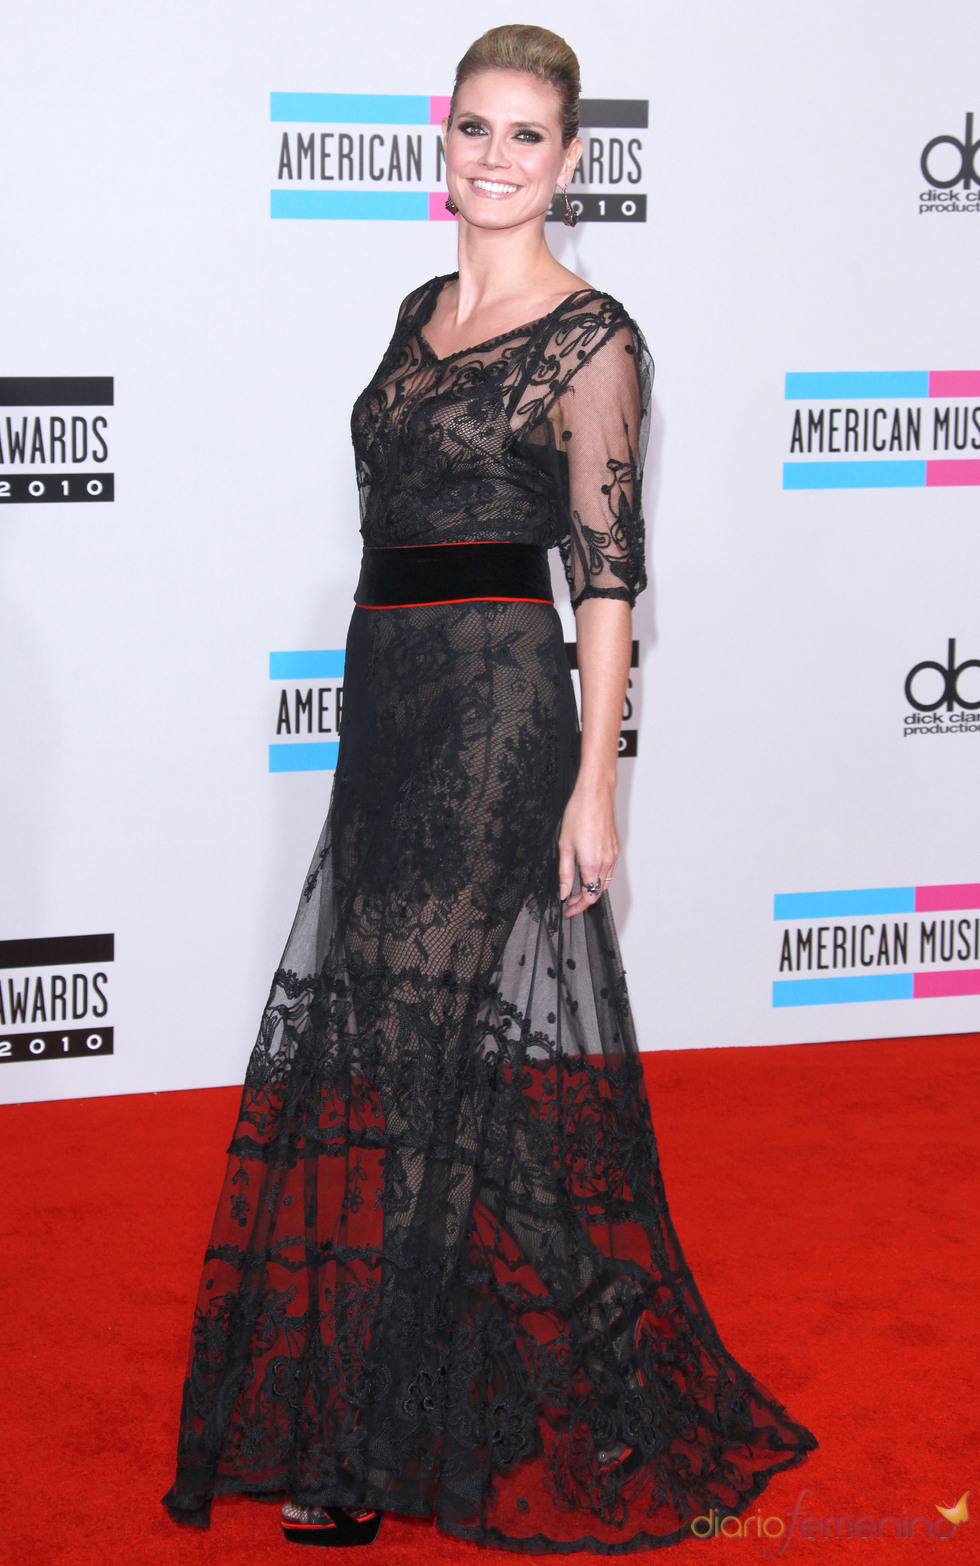 Heidi Klum en los American Music Awards 2010